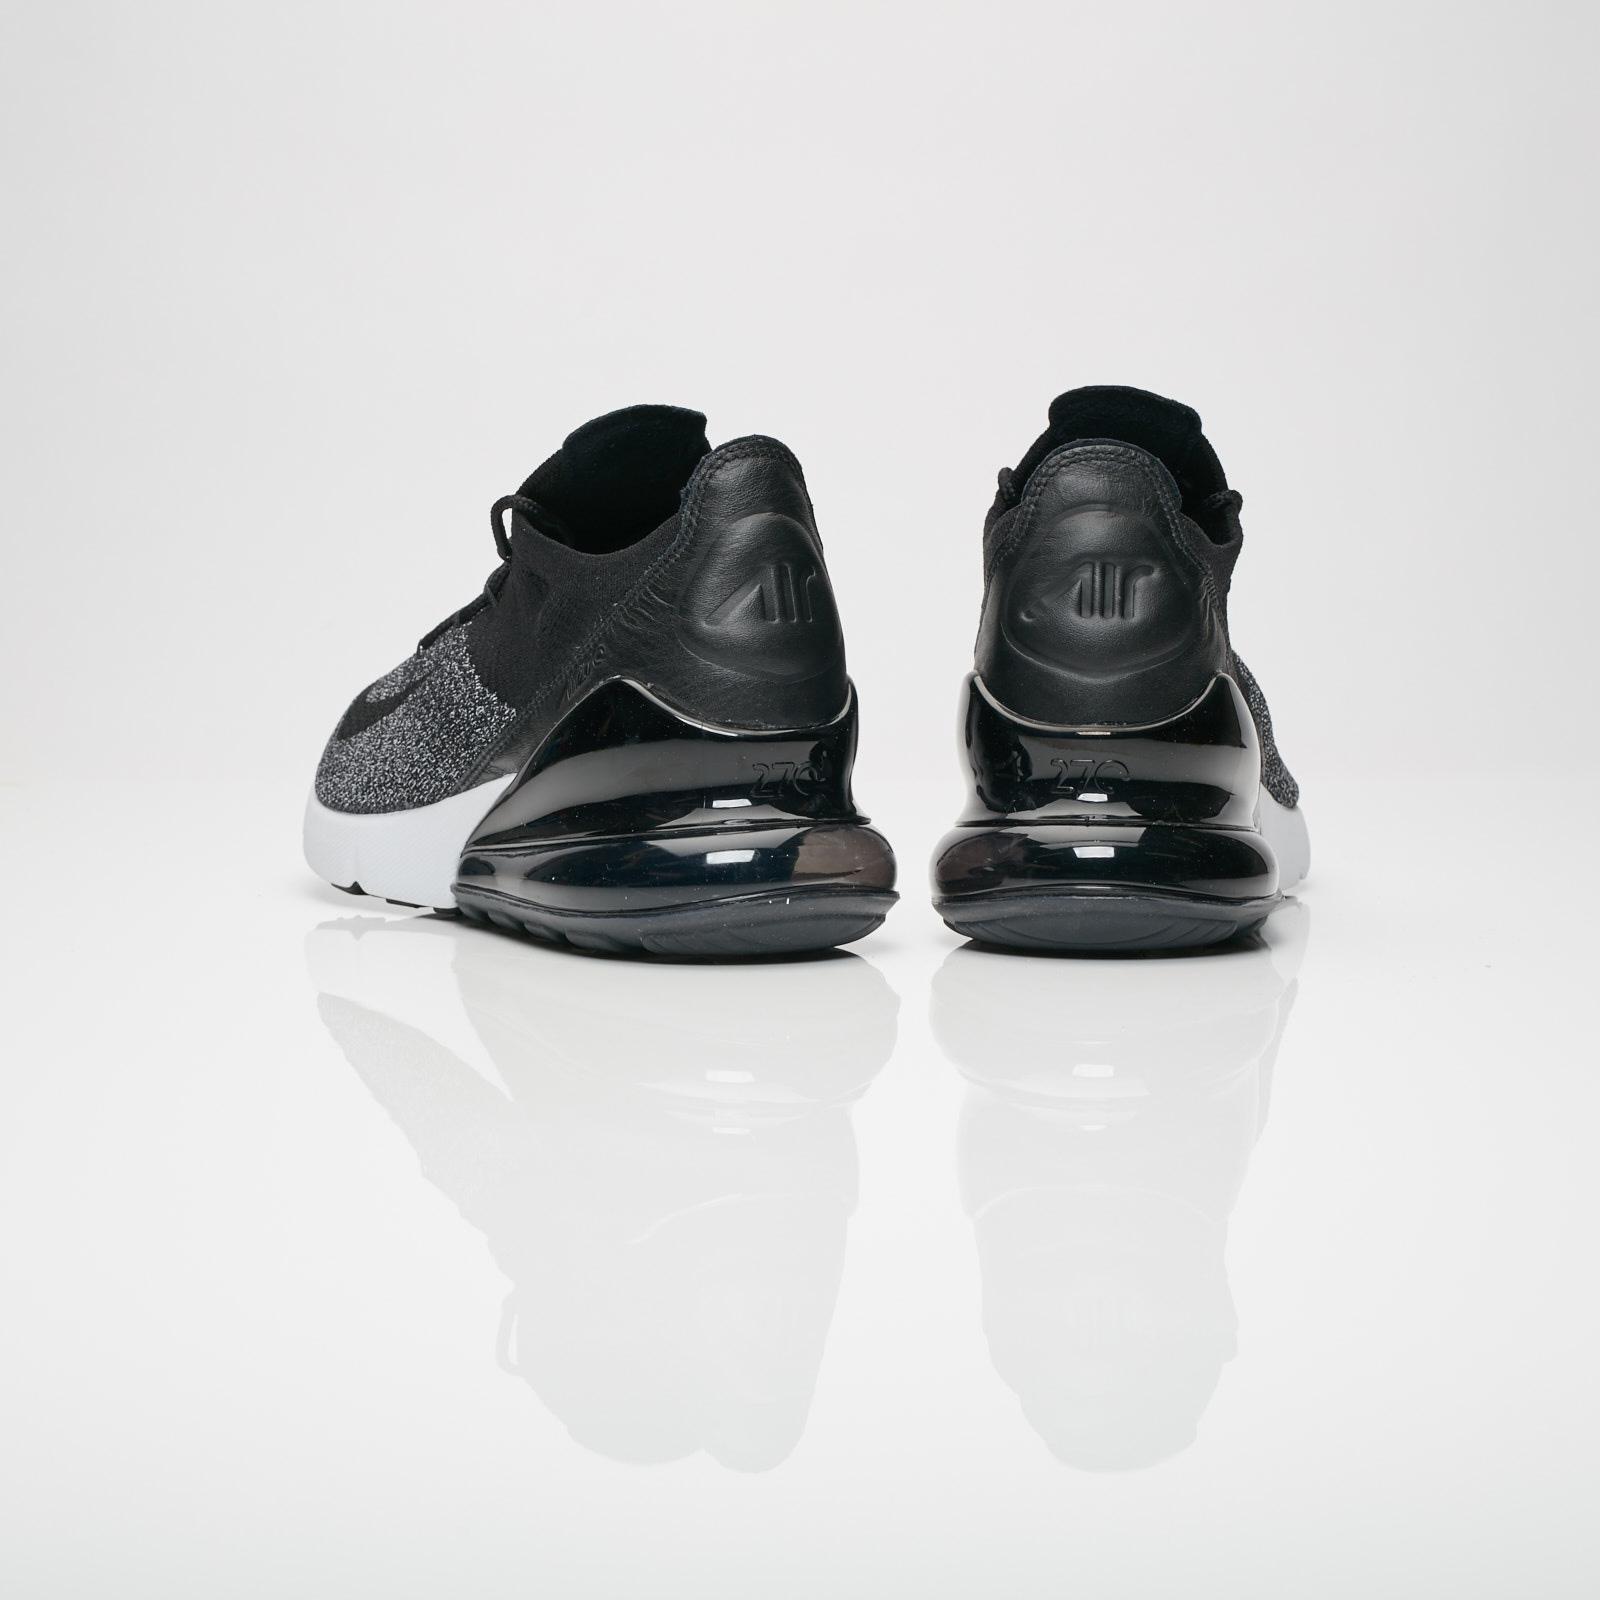 Ao1023 Flyknit Mens Blackblack White Oreo Max 270 Nike 001